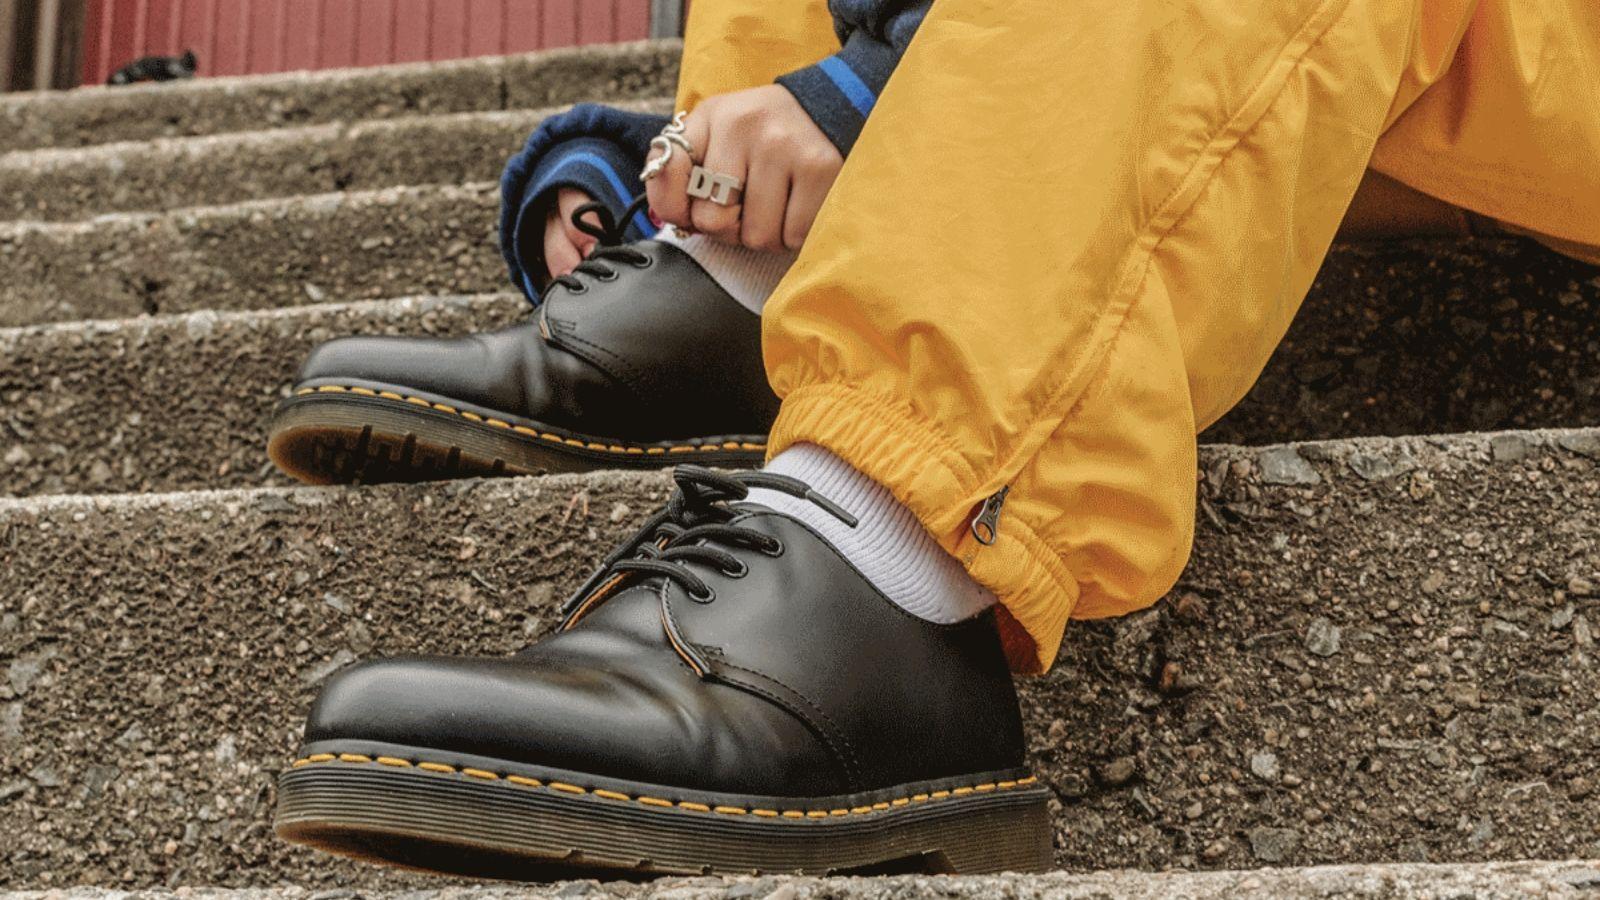 Dr Martens giày thuần chay